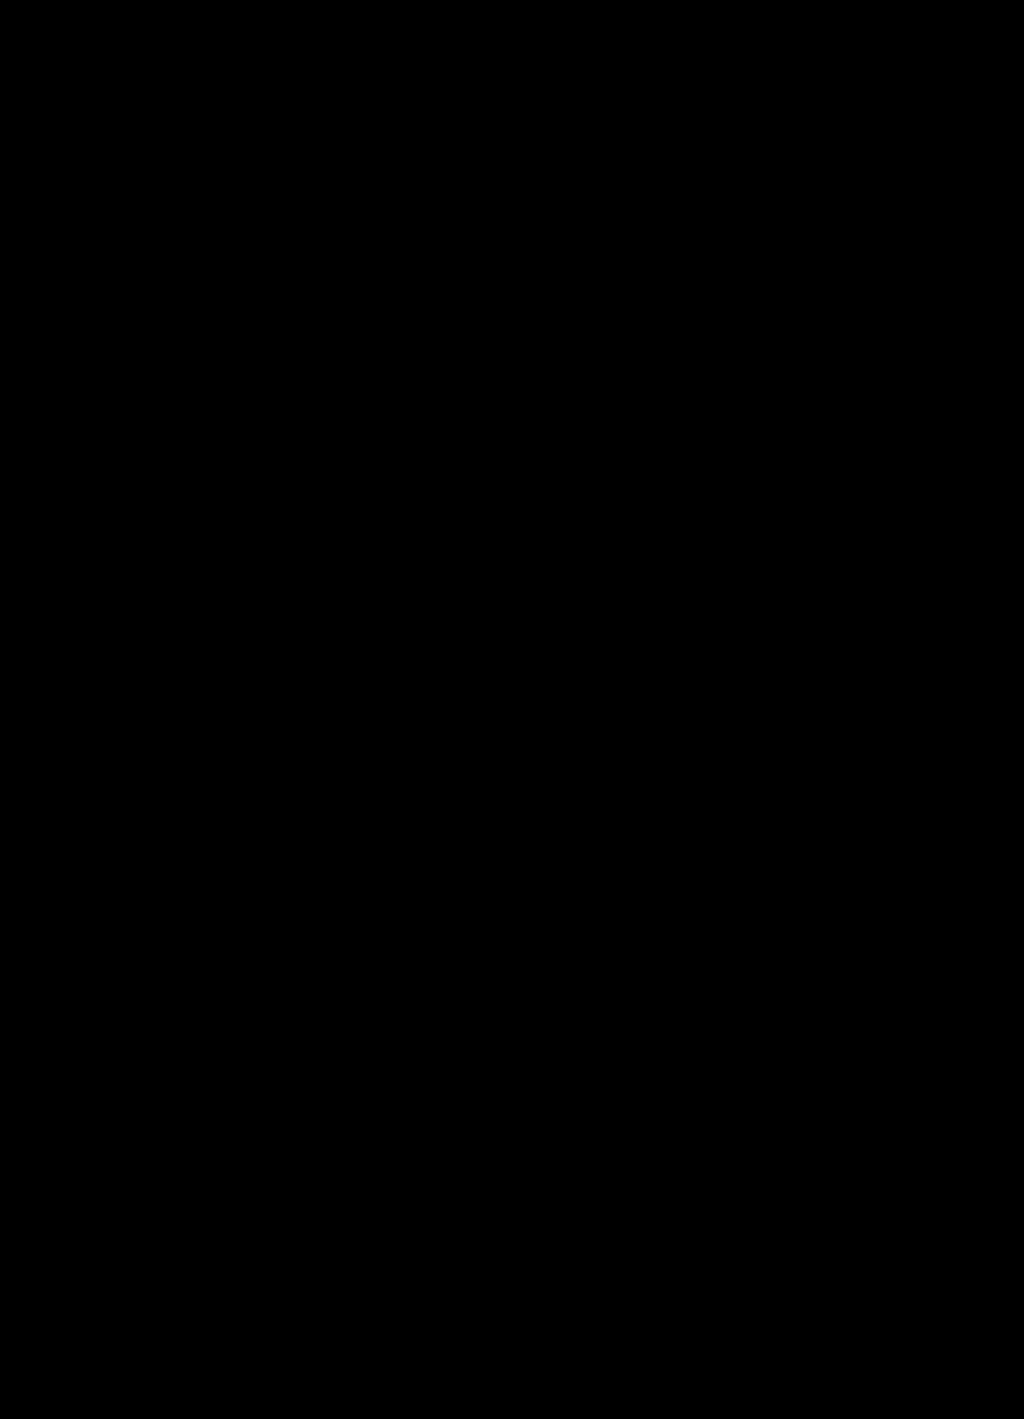 Spiderman logo clipart clip art free download Free Spiderman Logo, Download Free Clip Art, Free Clip Art ... clip art free download